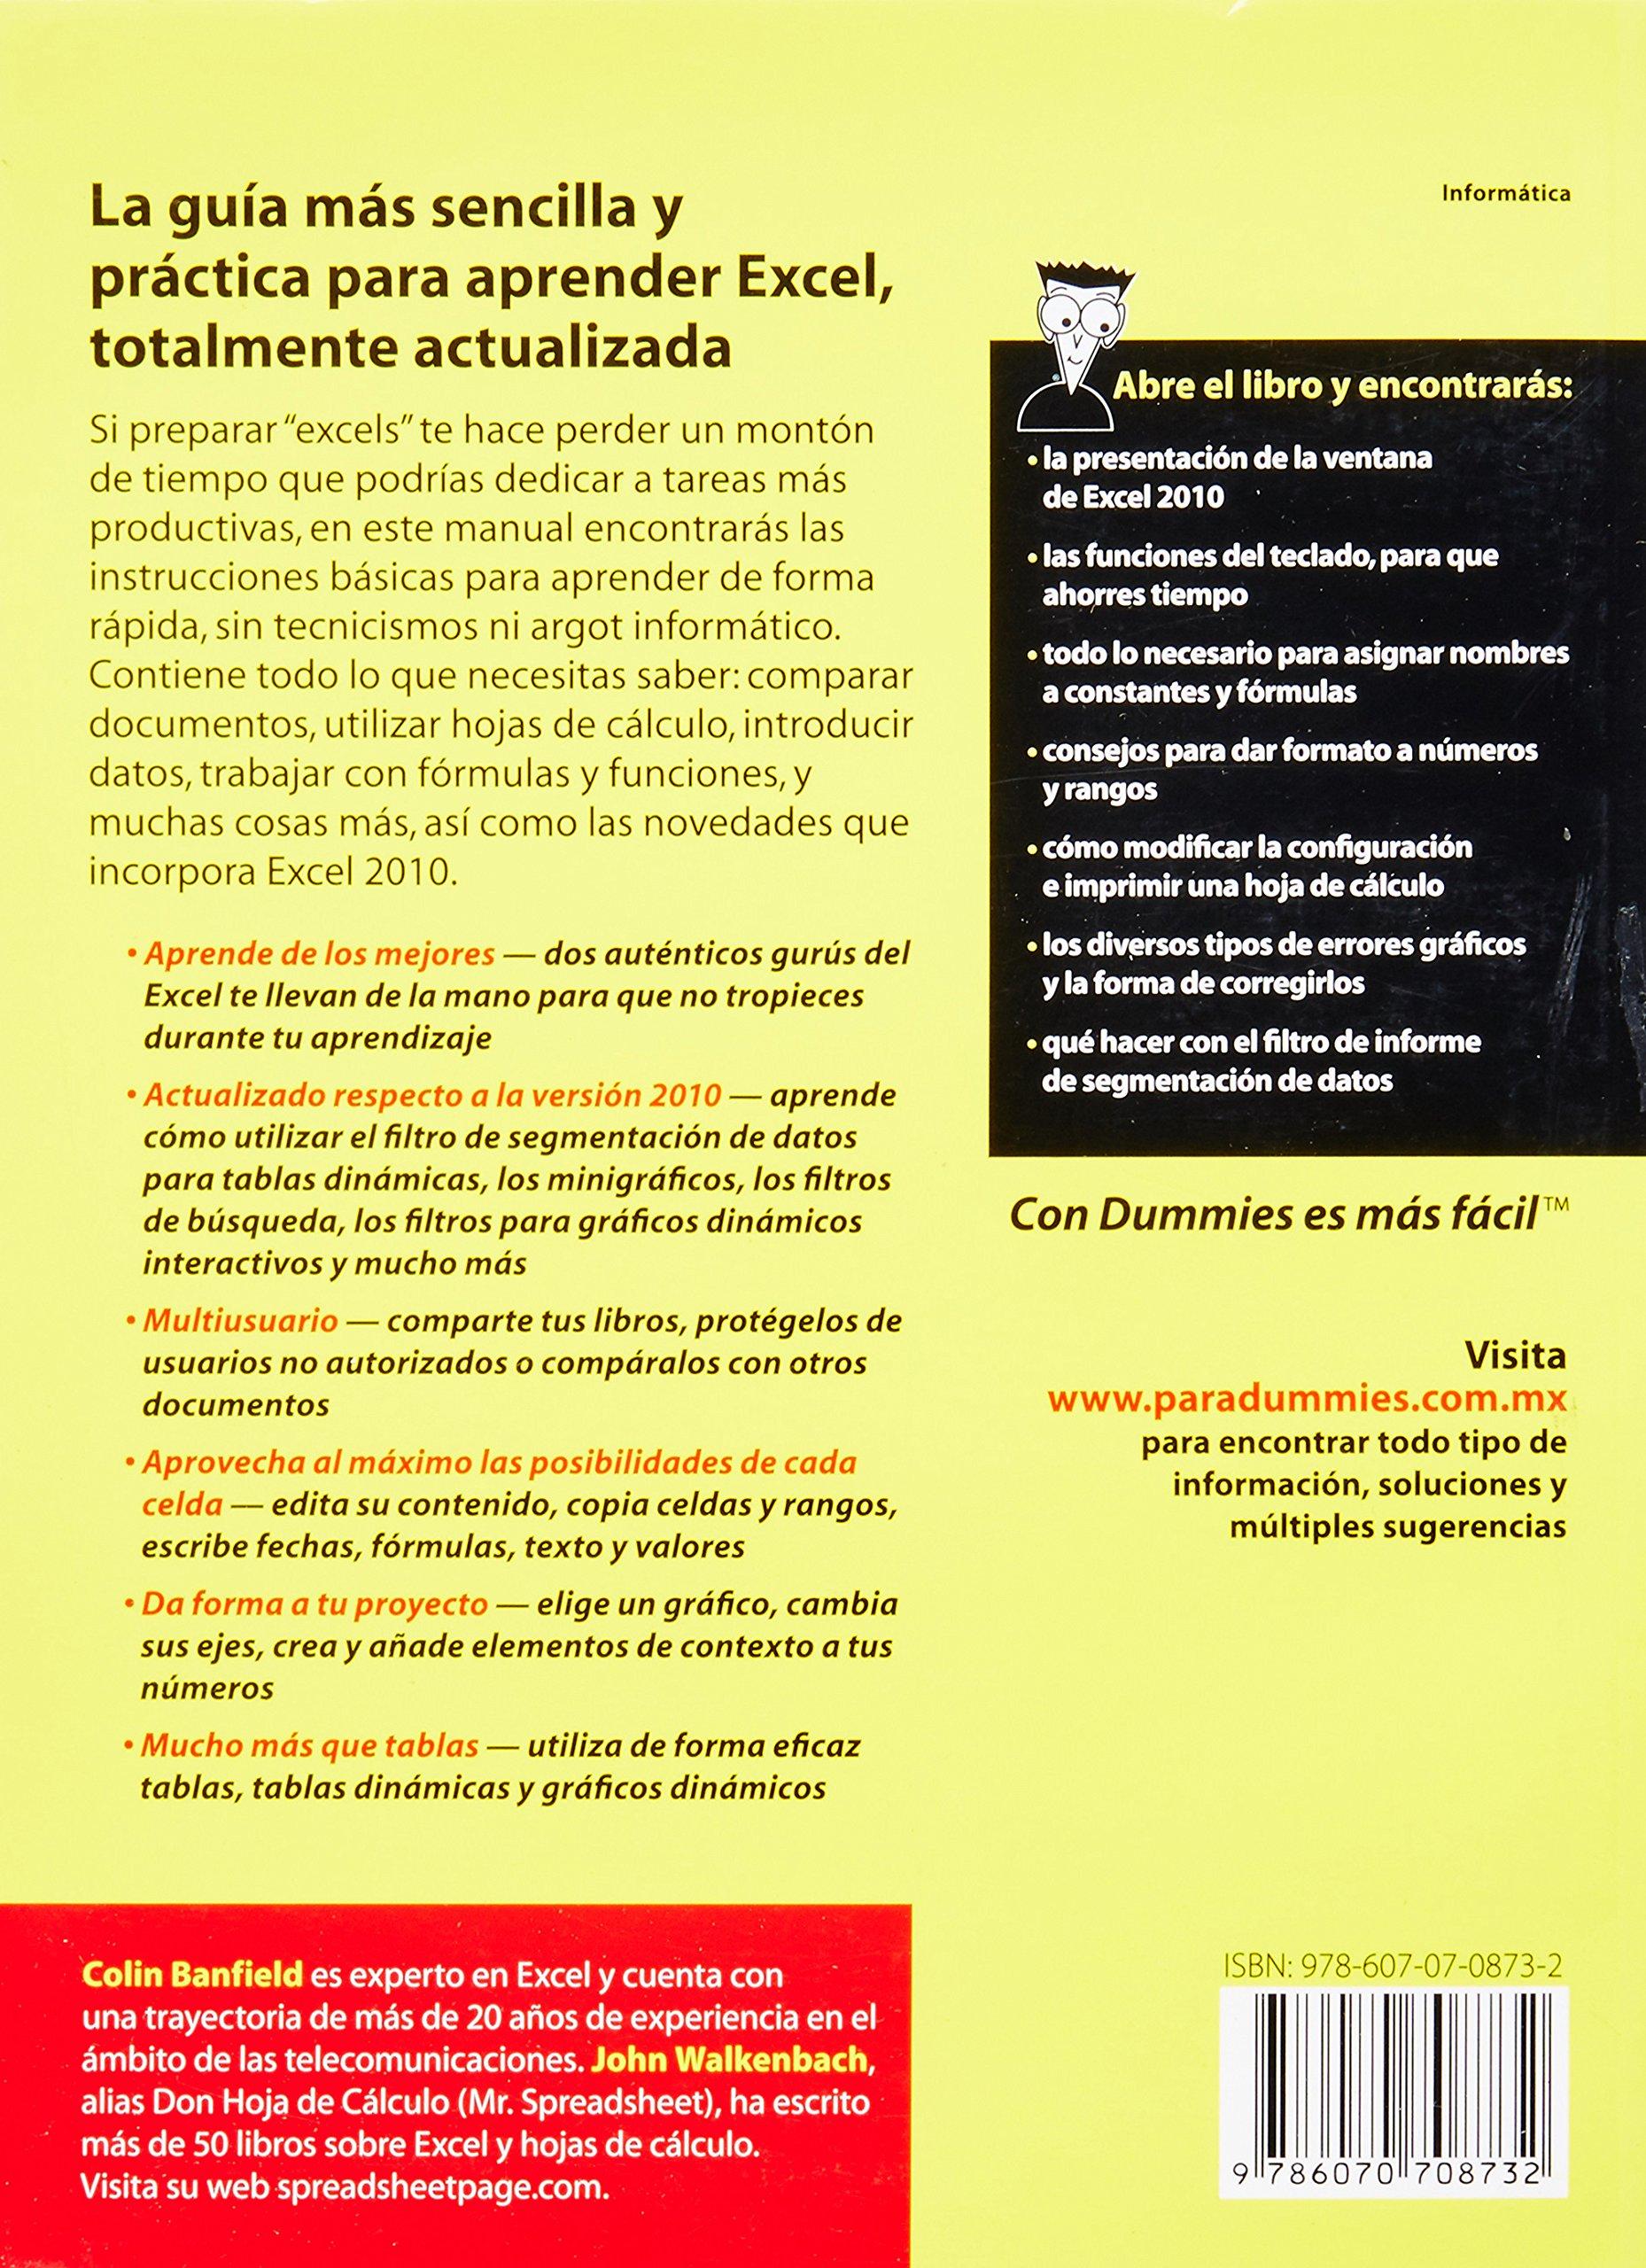 Excel 2010 para Dummies (Para Dummies/For Dummies) (Spanish Edition): Colin Banfield, John Walkenbach: 9786070708732: Amazon.com: Books